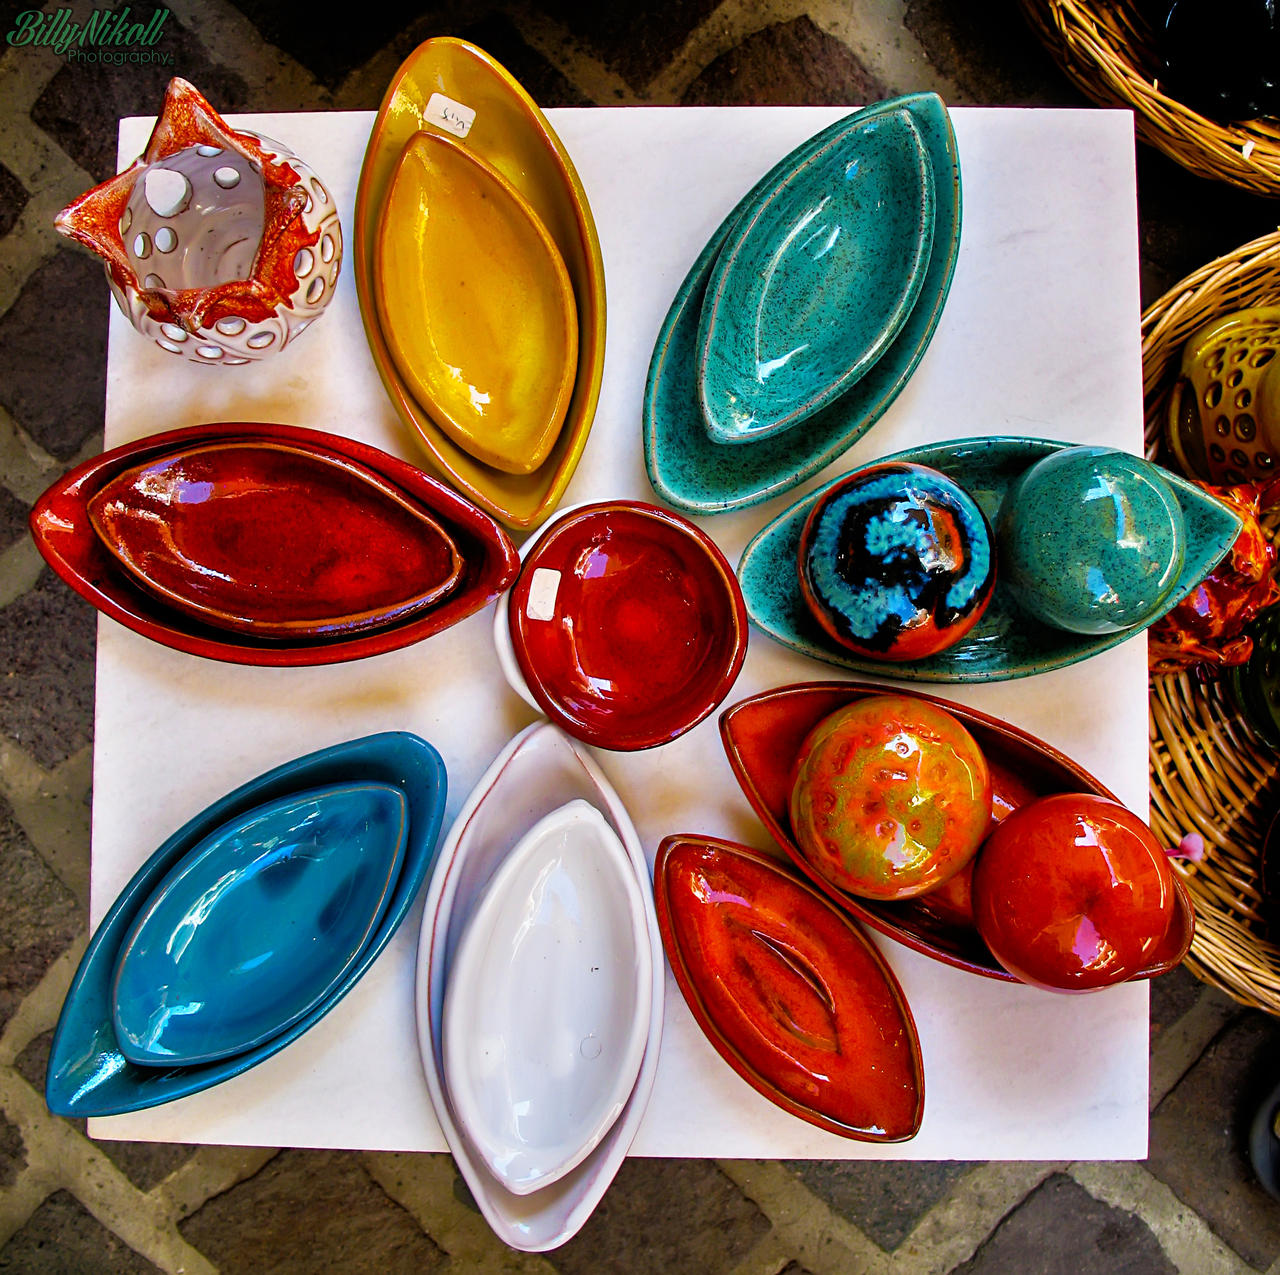 Traditional Handmade Ceramic Bowls by BillyNikoll